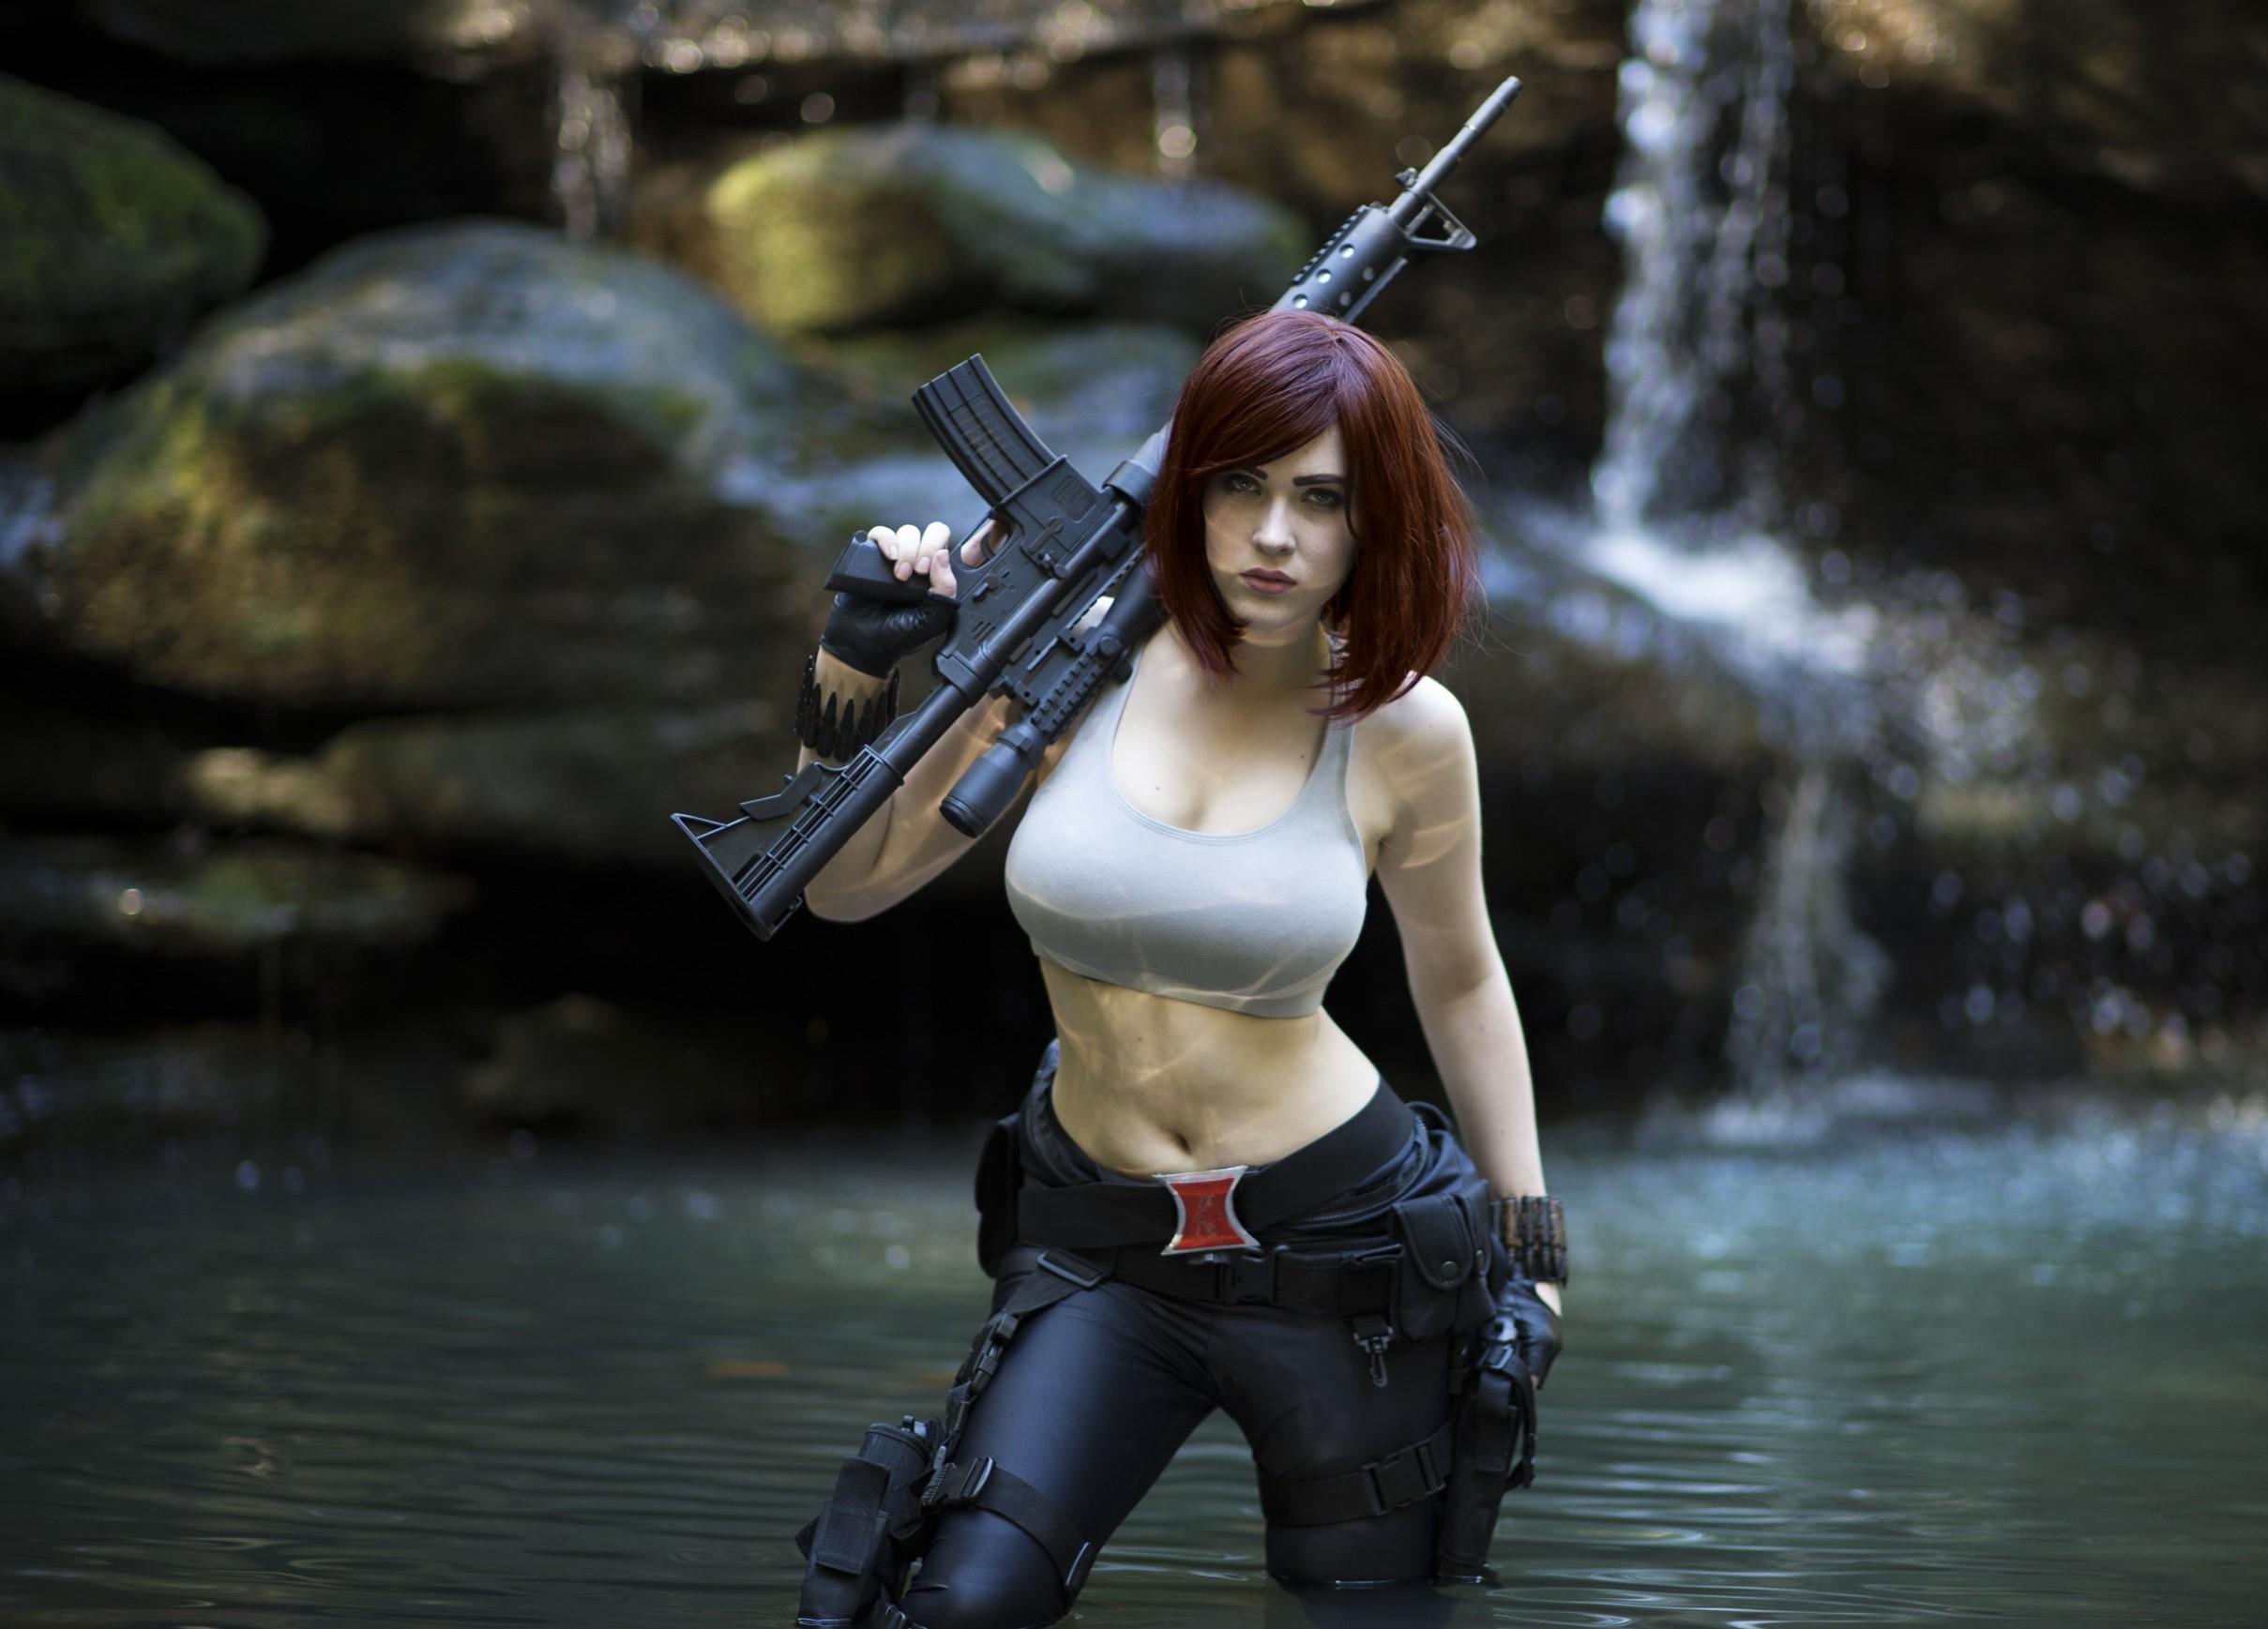 Wallpaper : gun, women, redhead, cosplay, model, water